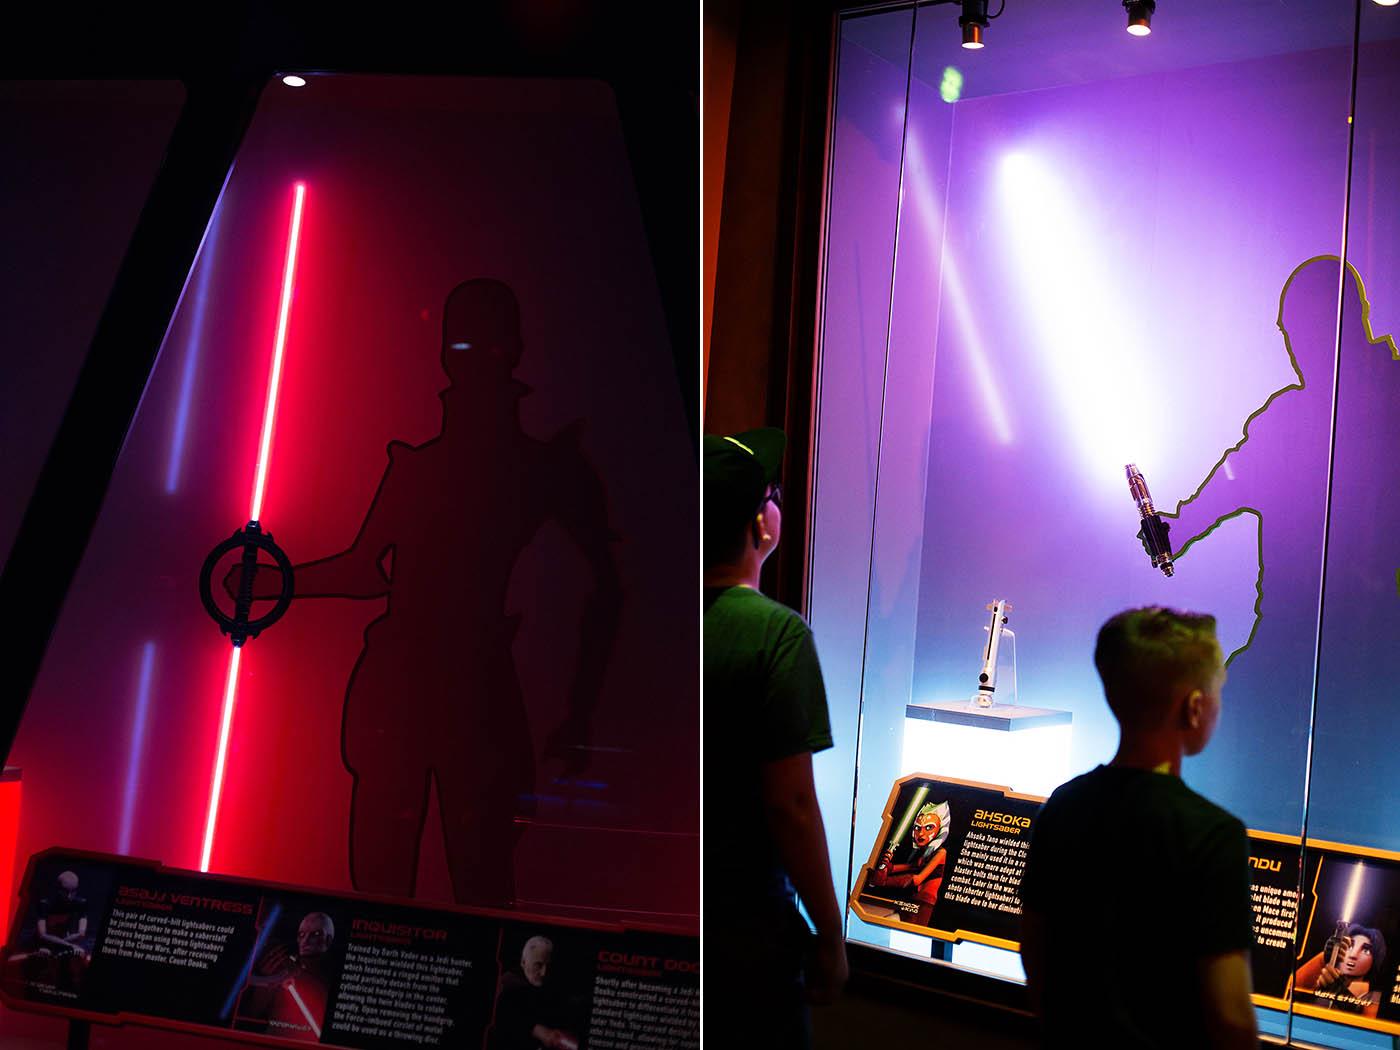 5 Ways to Celebrate Star Wars at Disneyland during Season of the Force!